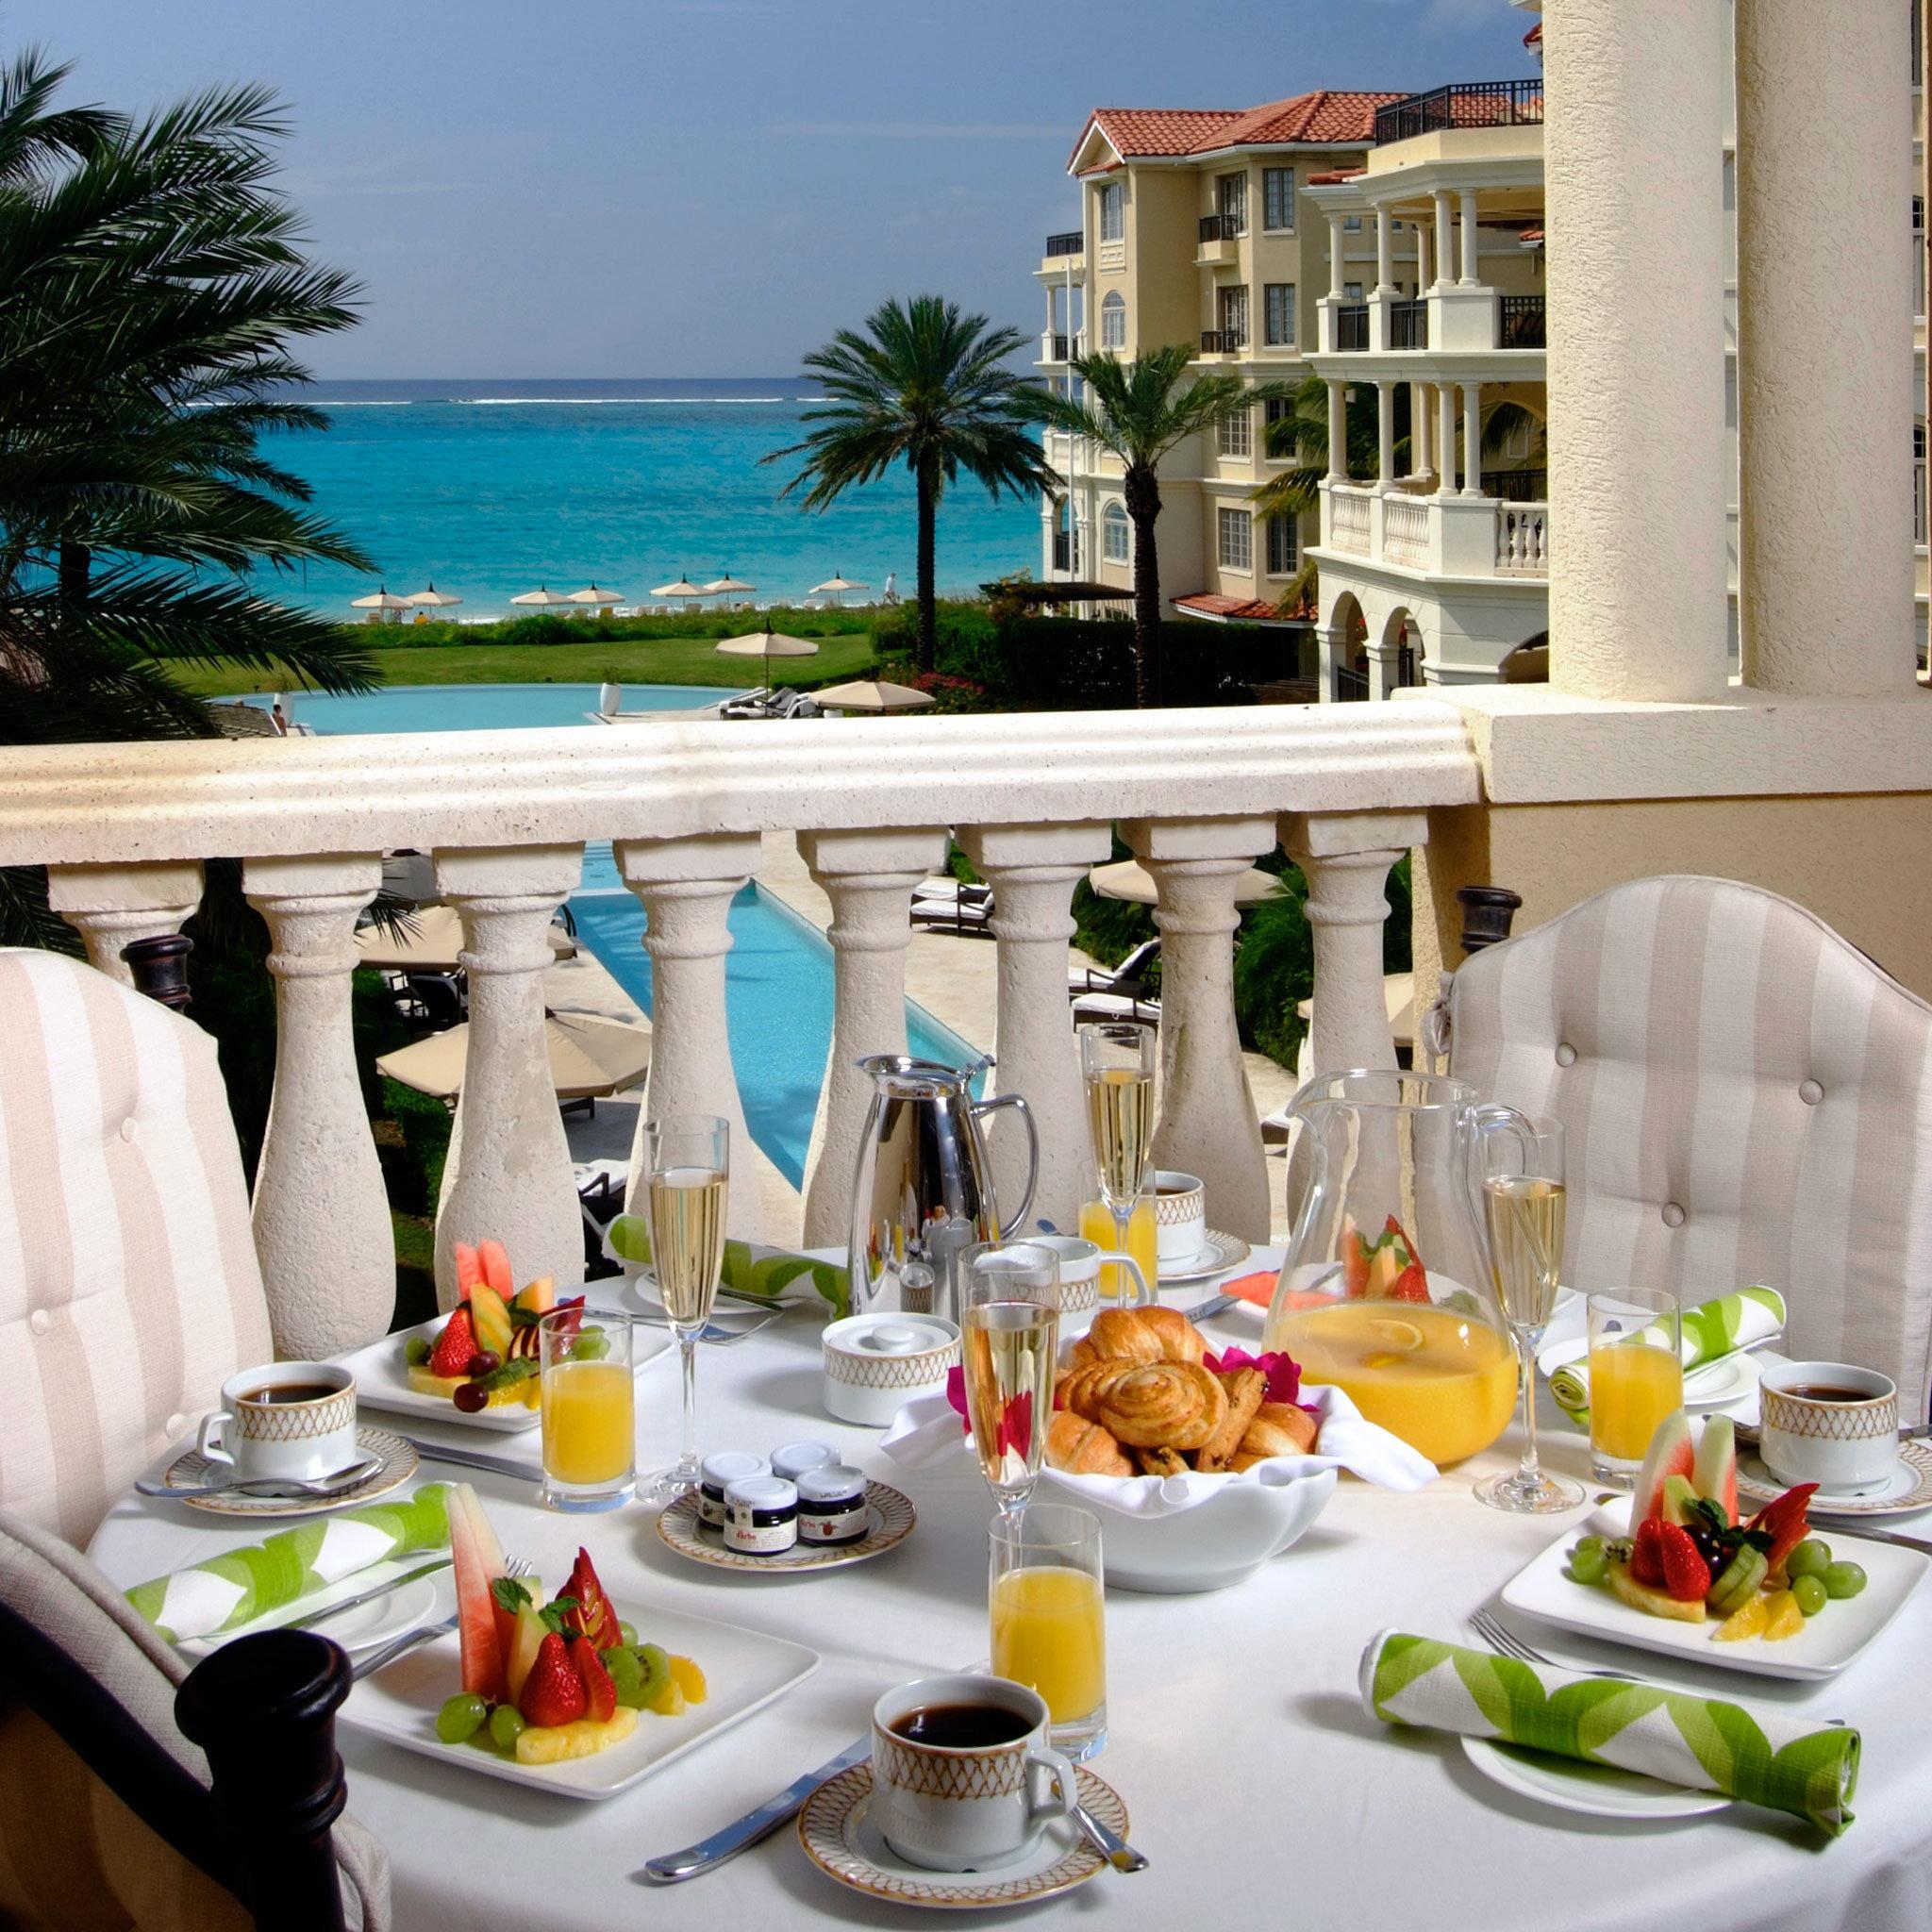 Drink Eat Resort plate restaurant home brunch lunch overlooking